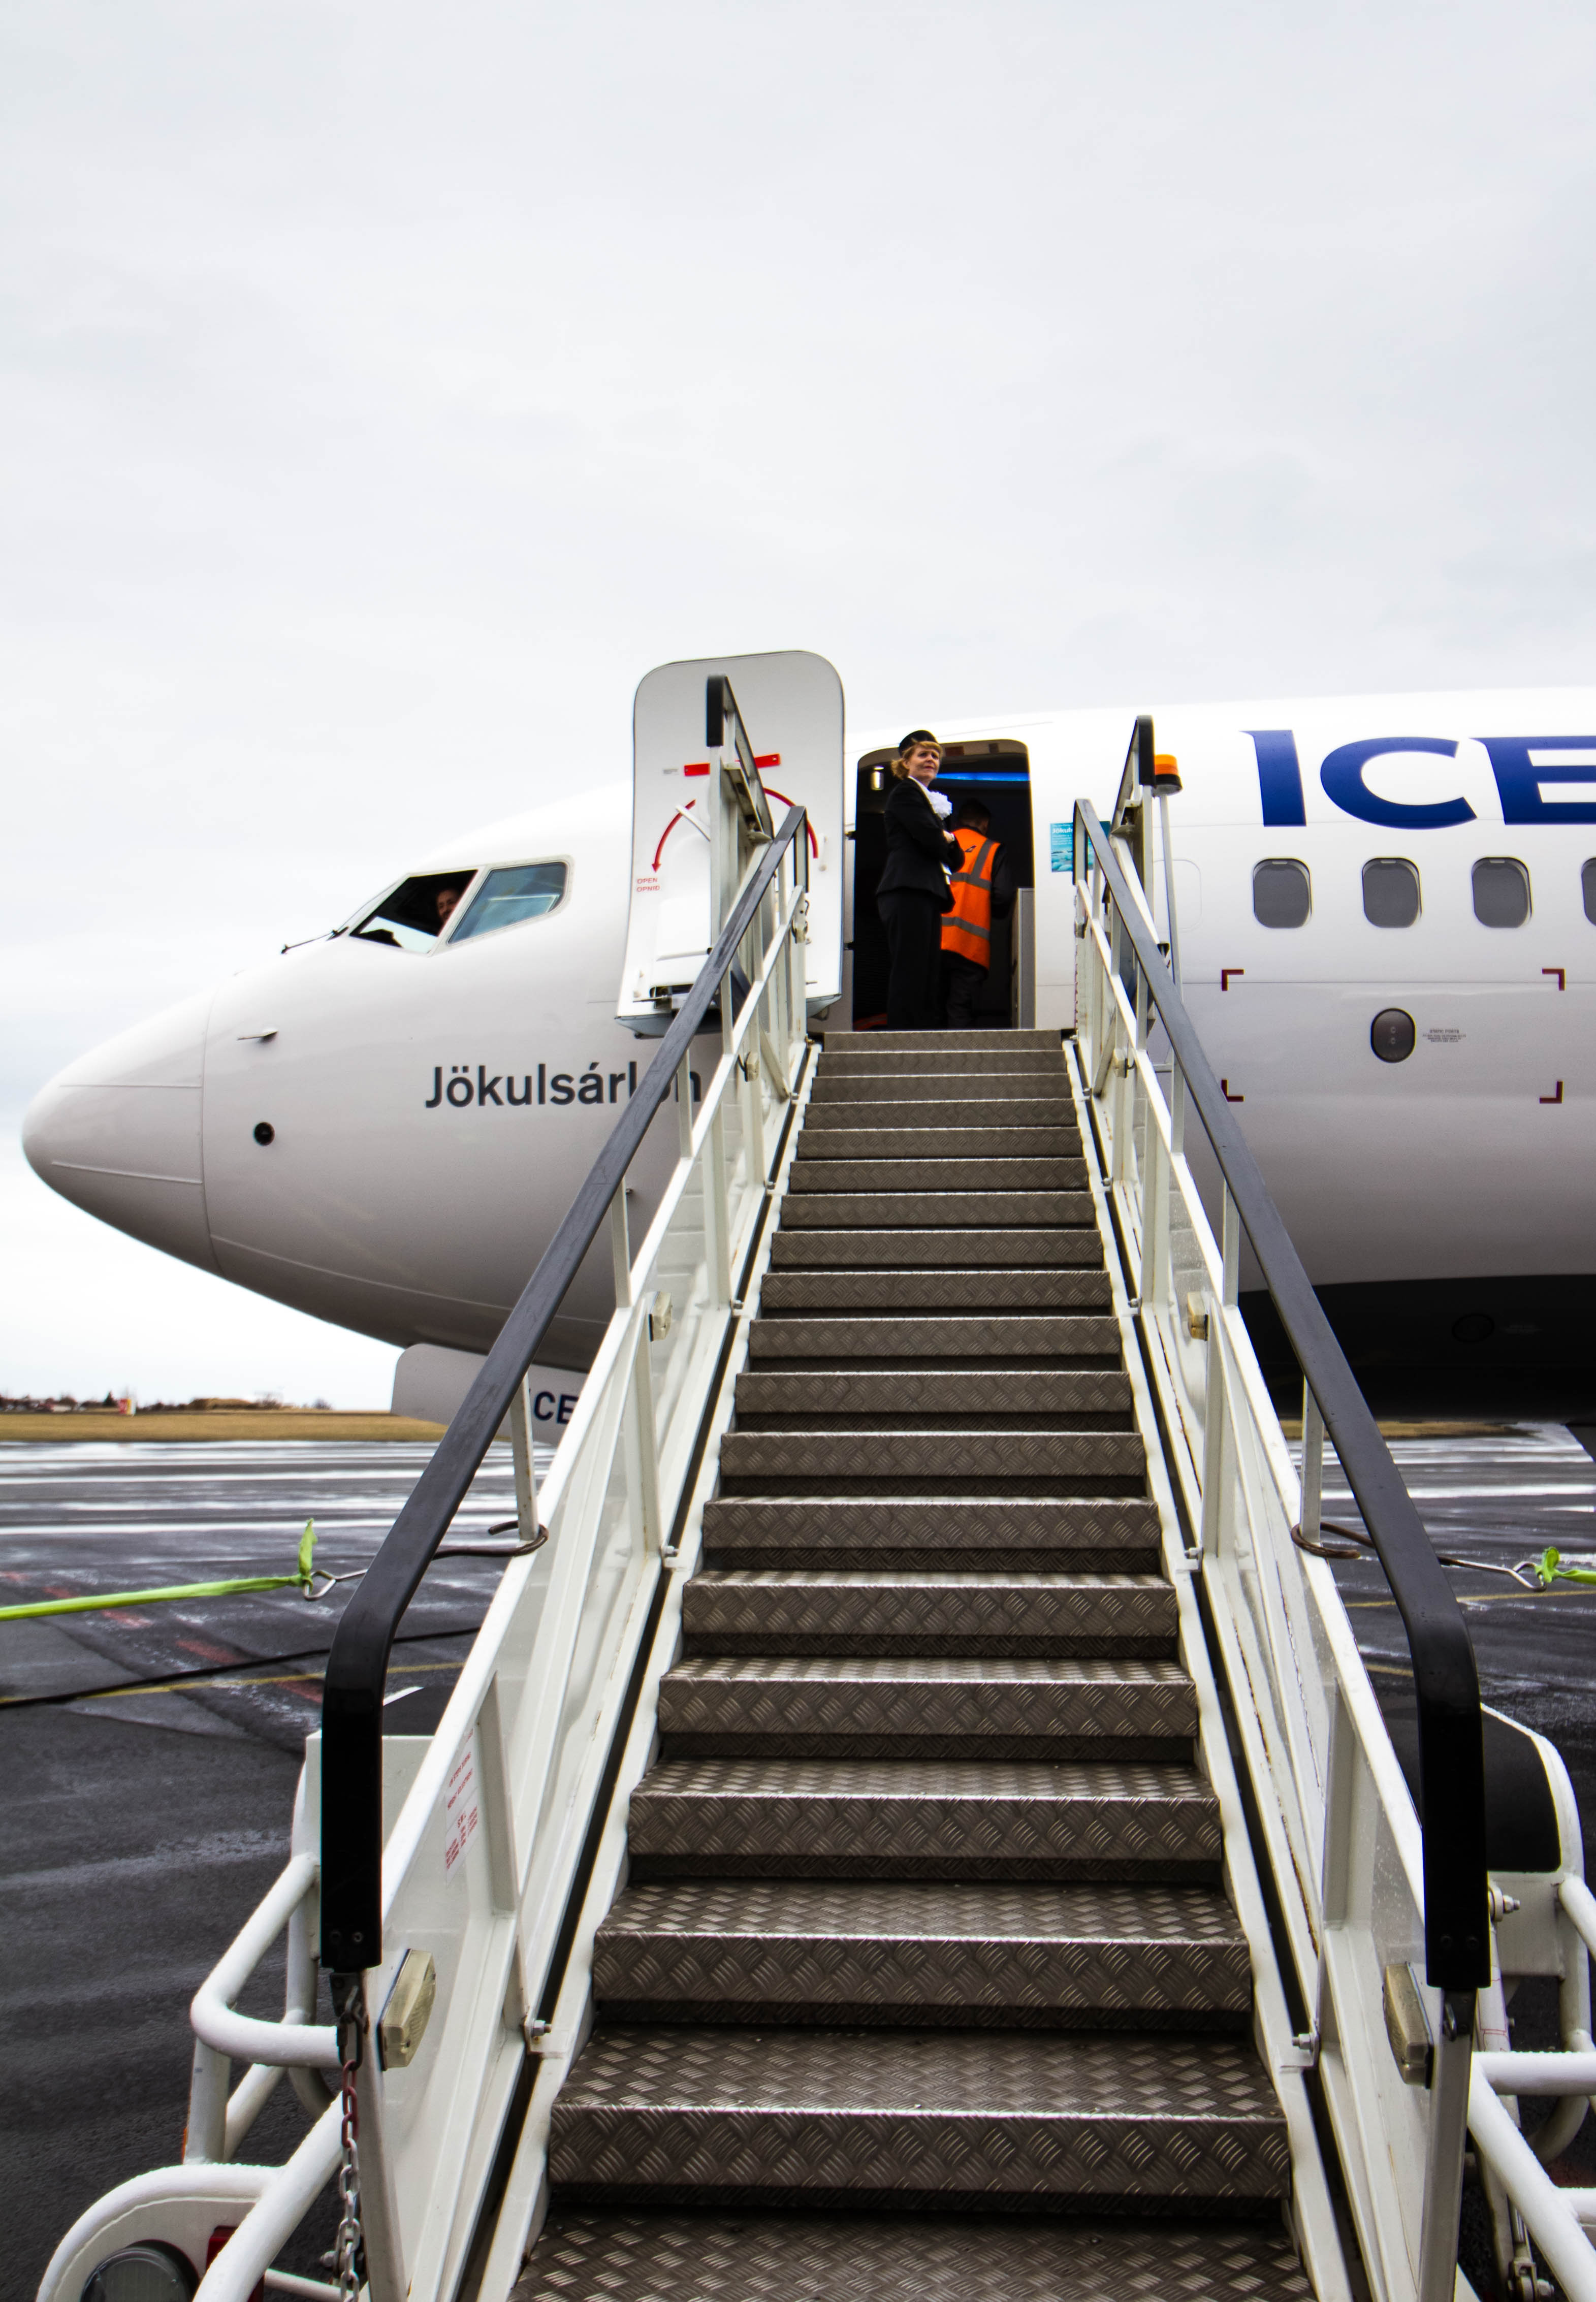 Icelandair Boeing 737 MAX 8 TF-ICE Jökulsárslón in Reykjavik // Source: Alina Daneliia (specially for Flugblogg)